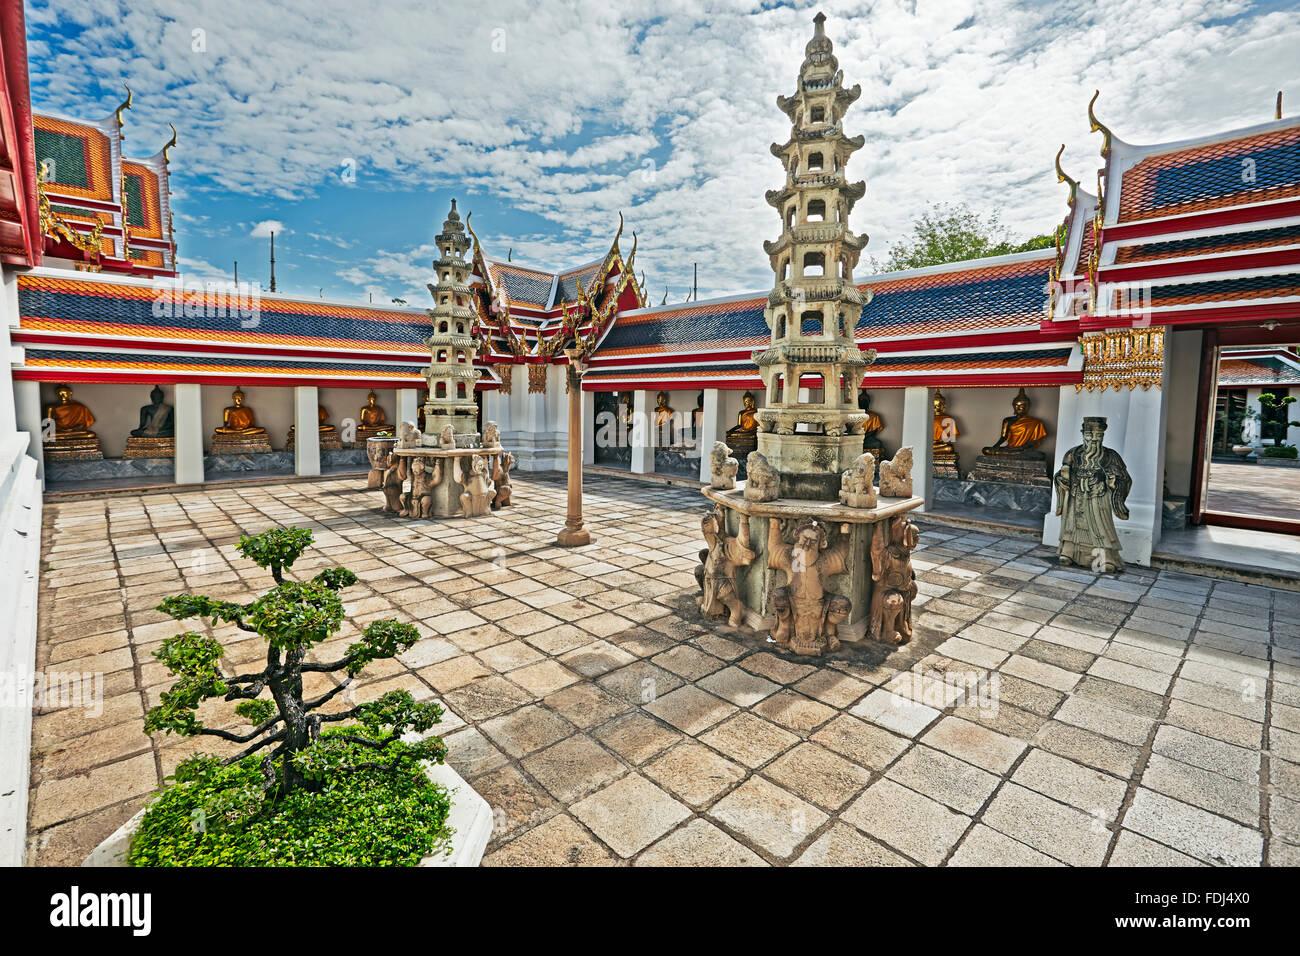 Wat Pho Temple, Bangkok, Thailand. - Stock Image